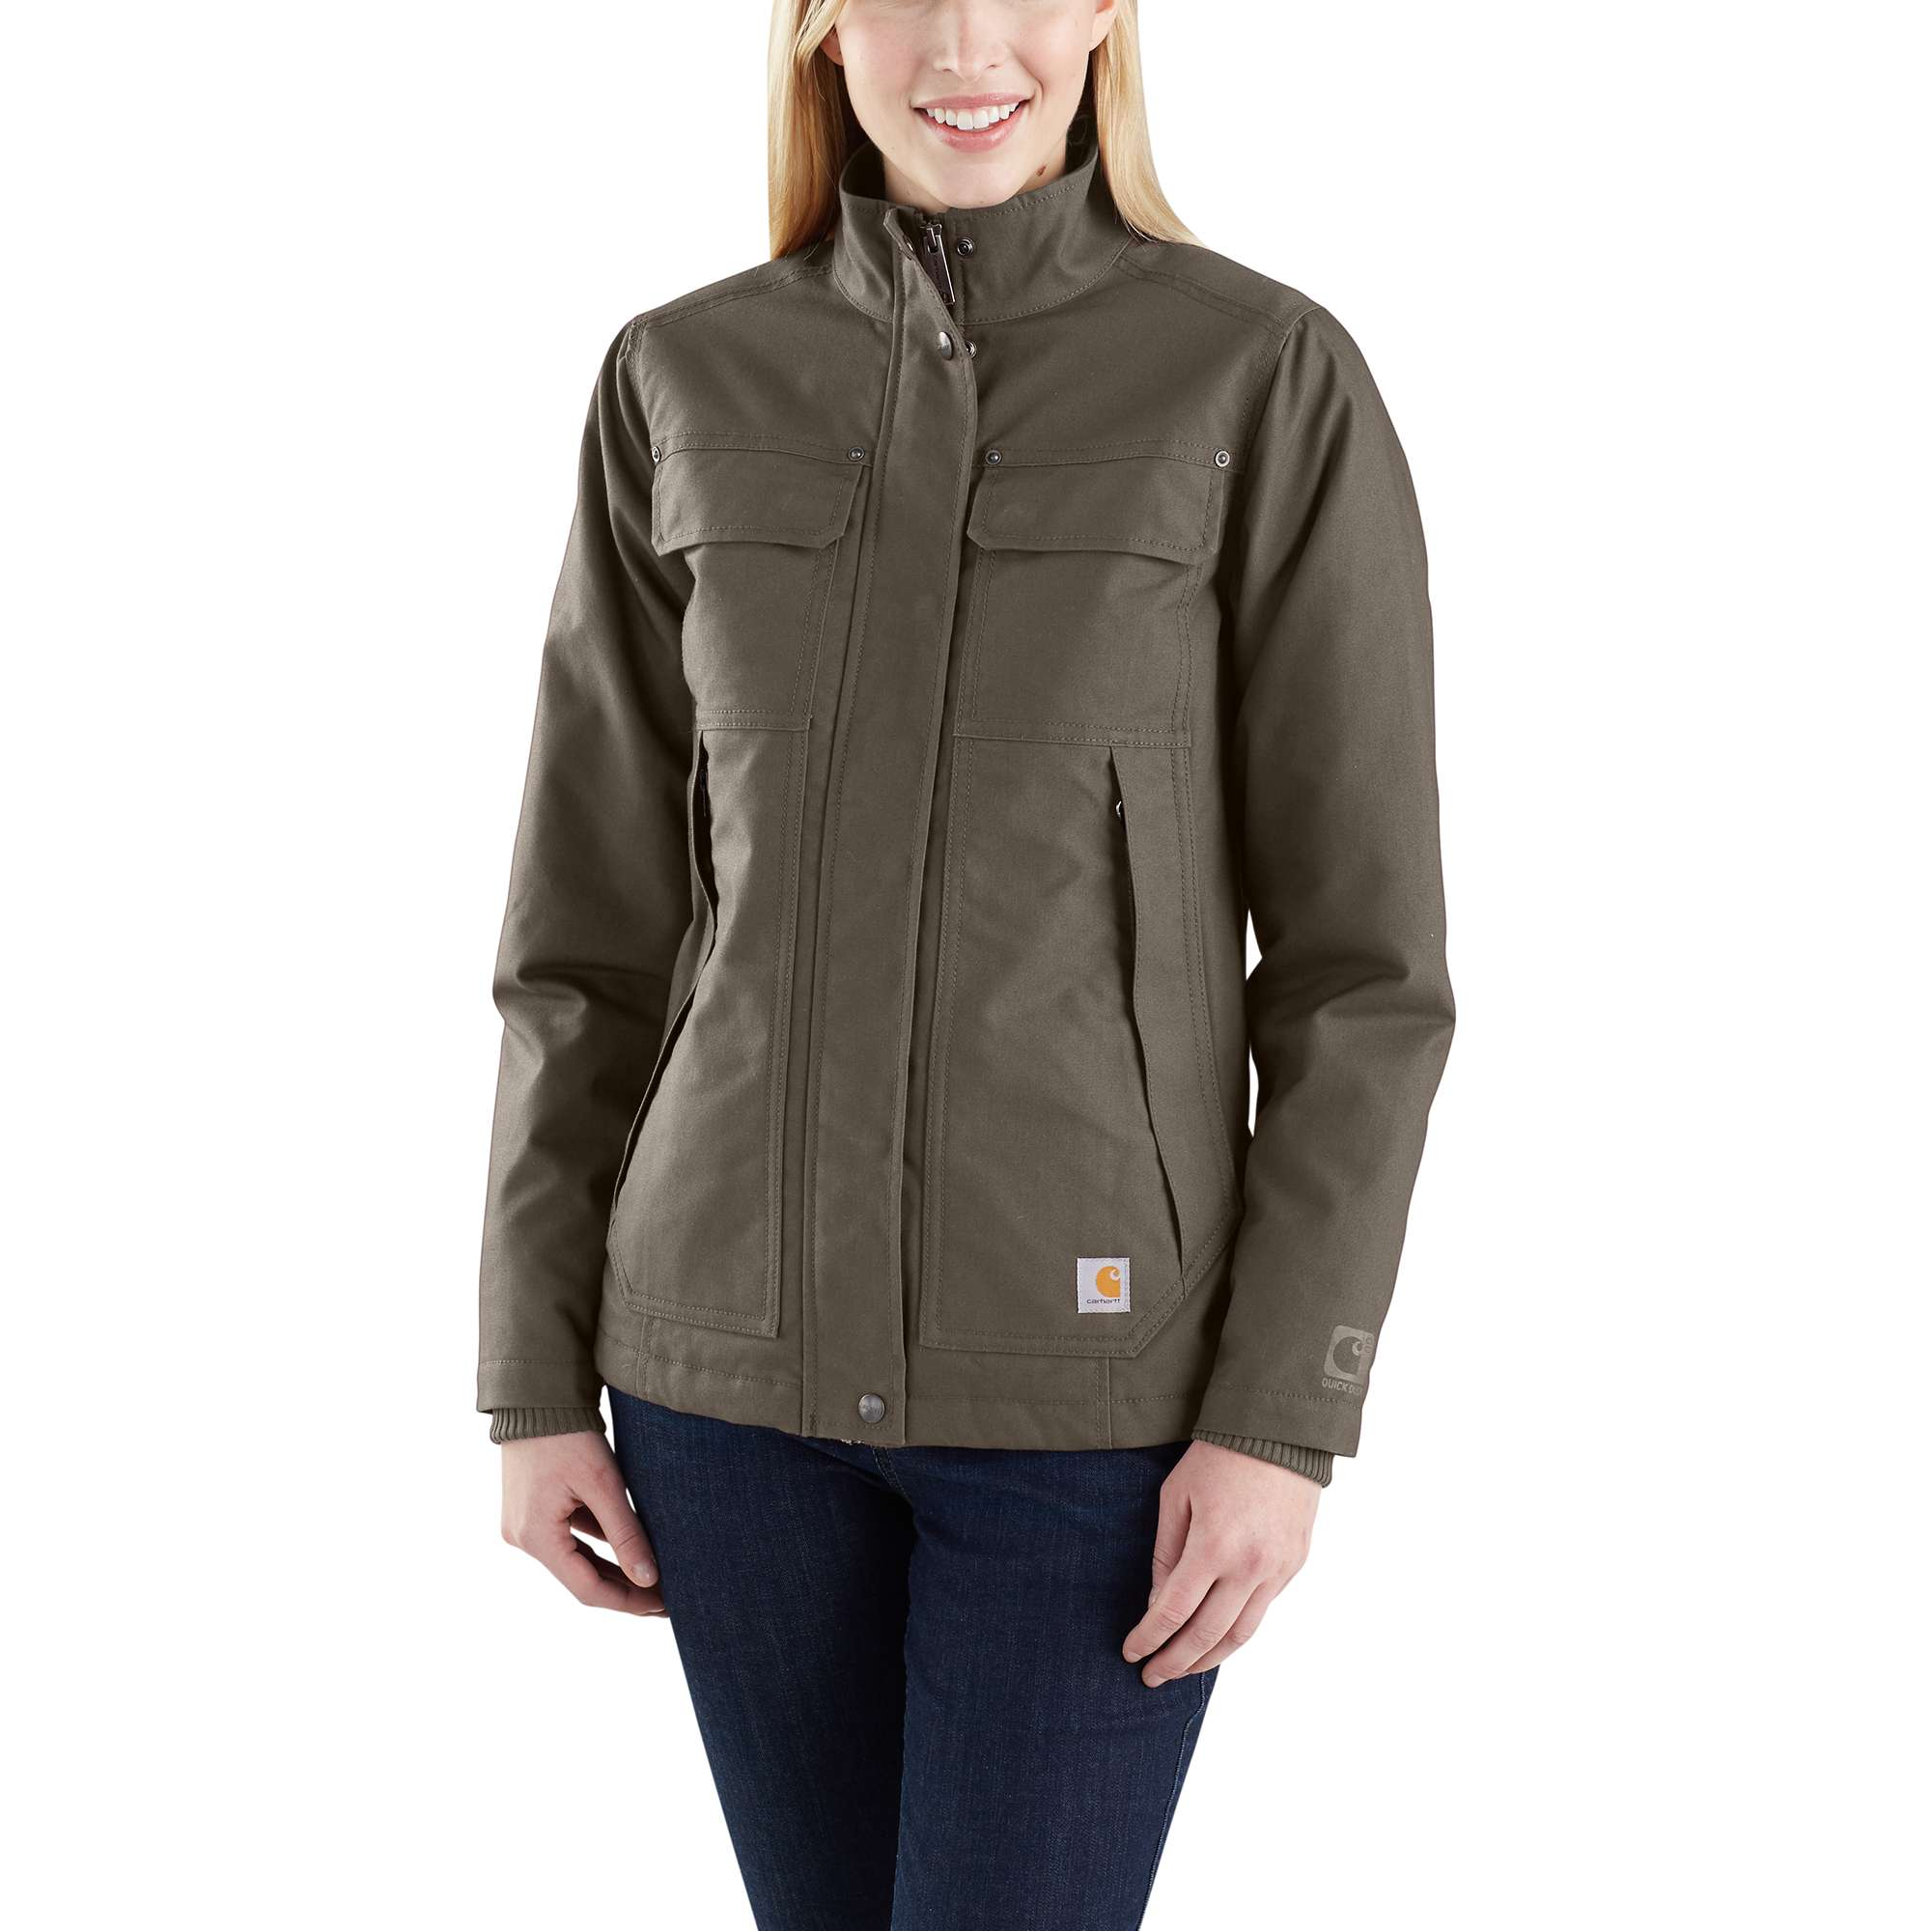 Carhartt Women's Quick Duck Jefferson Traditional Jacket Size: LG